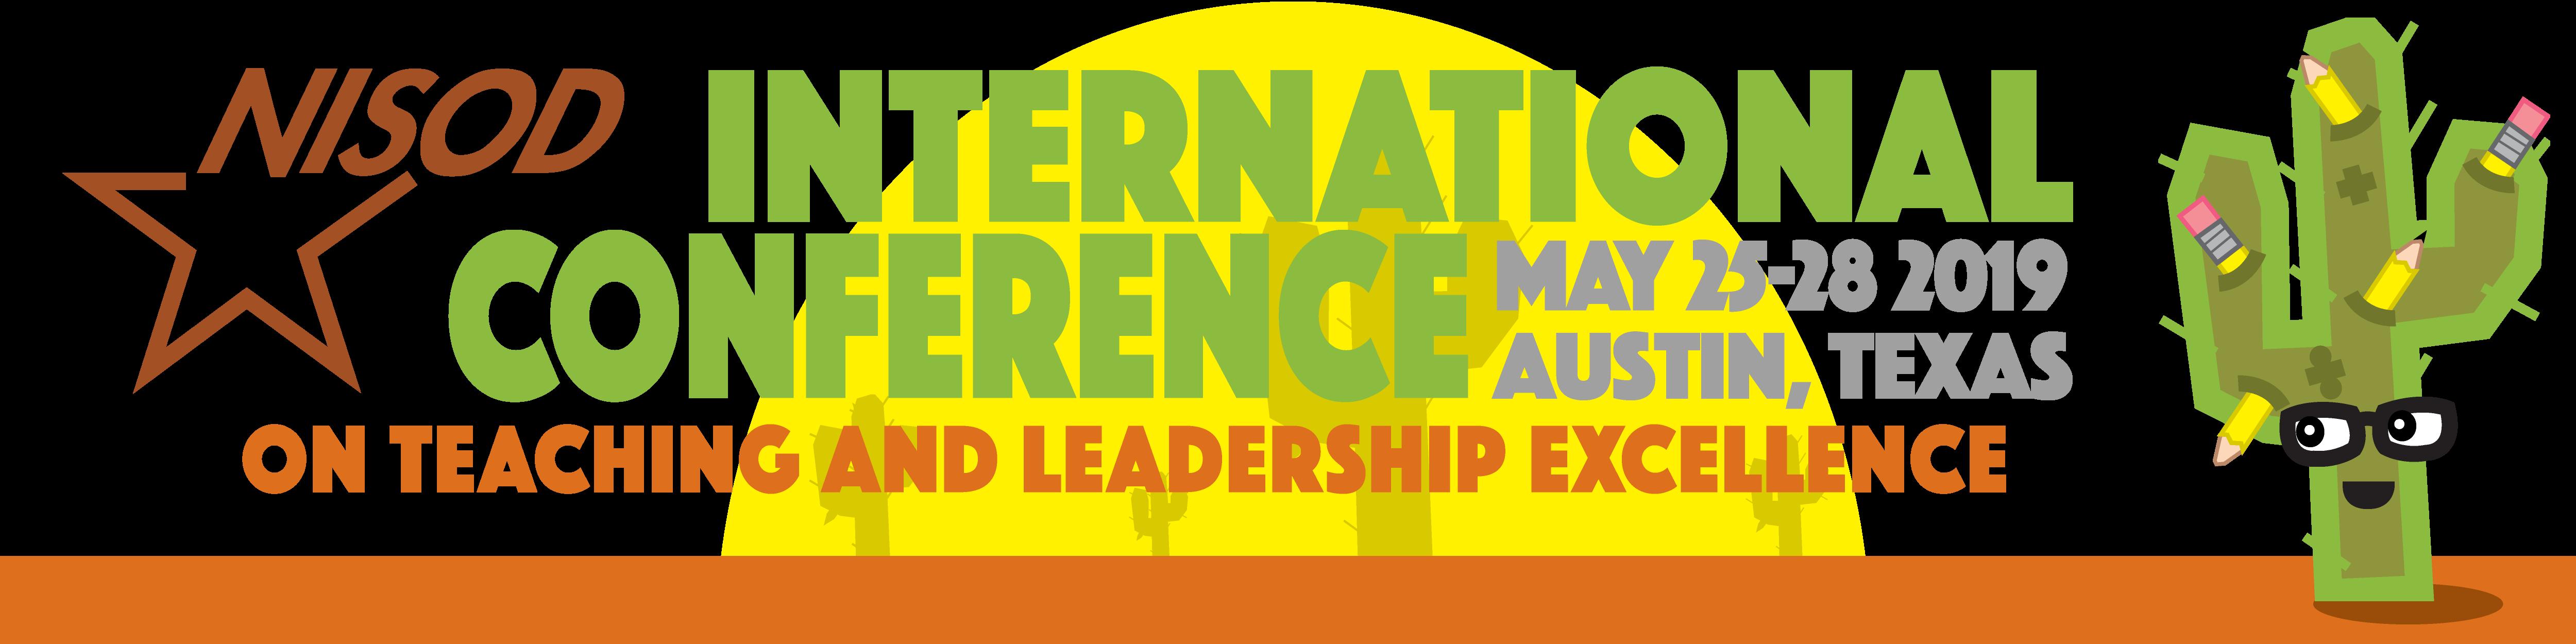 2019 NISOD Conference Banner image